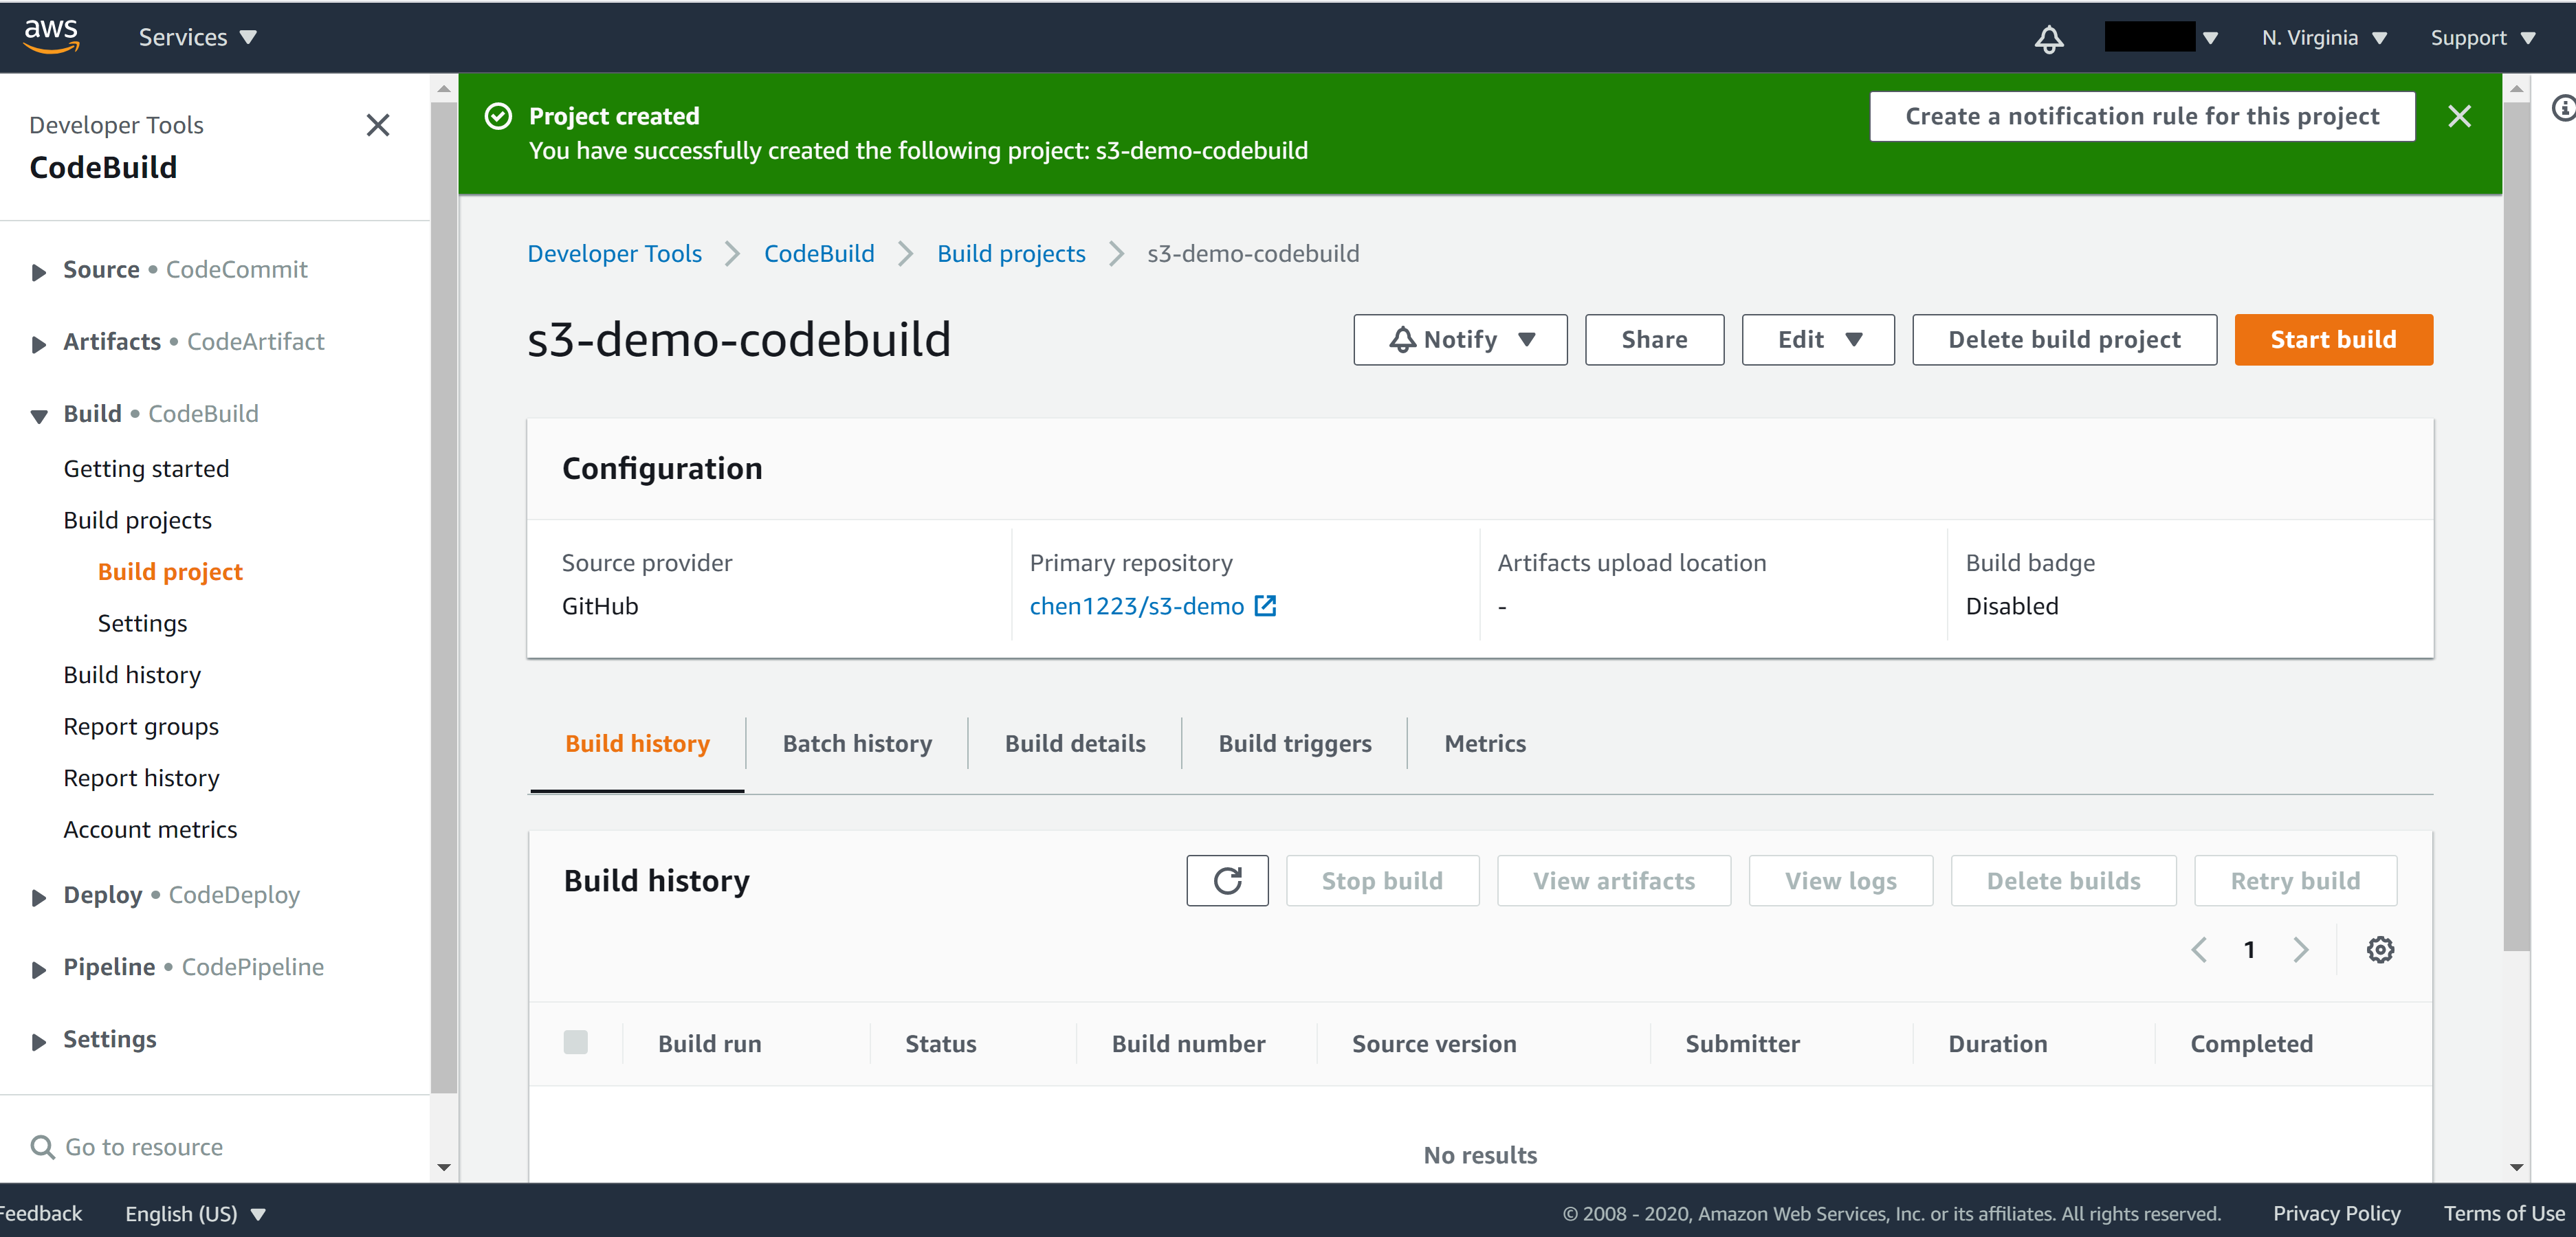 CodeBuild created